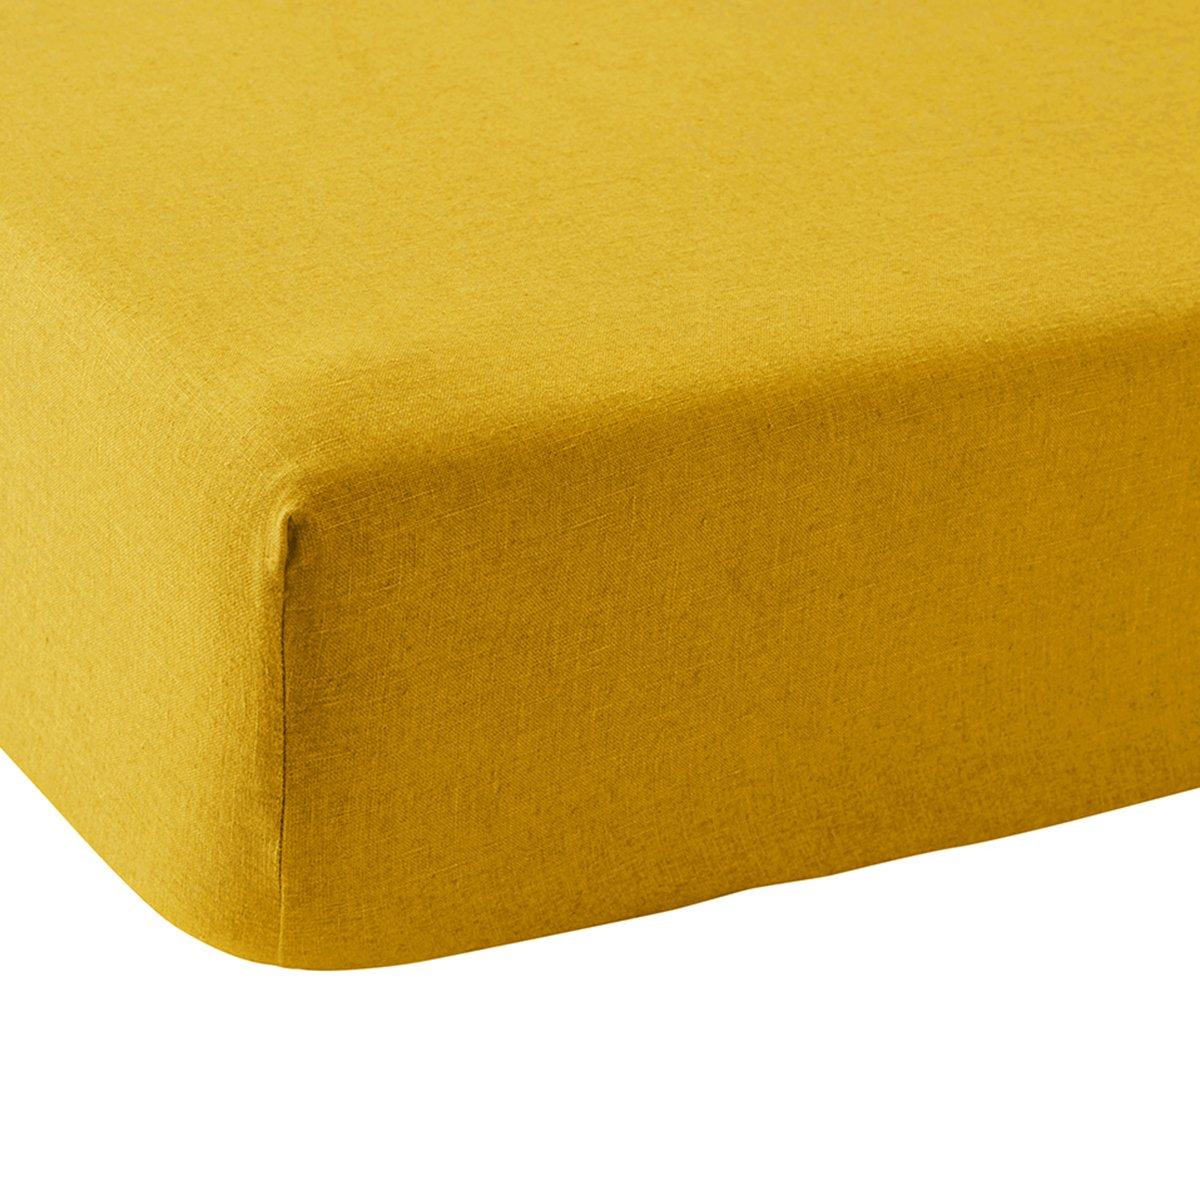 Drap housse lin 140x190 cm miel